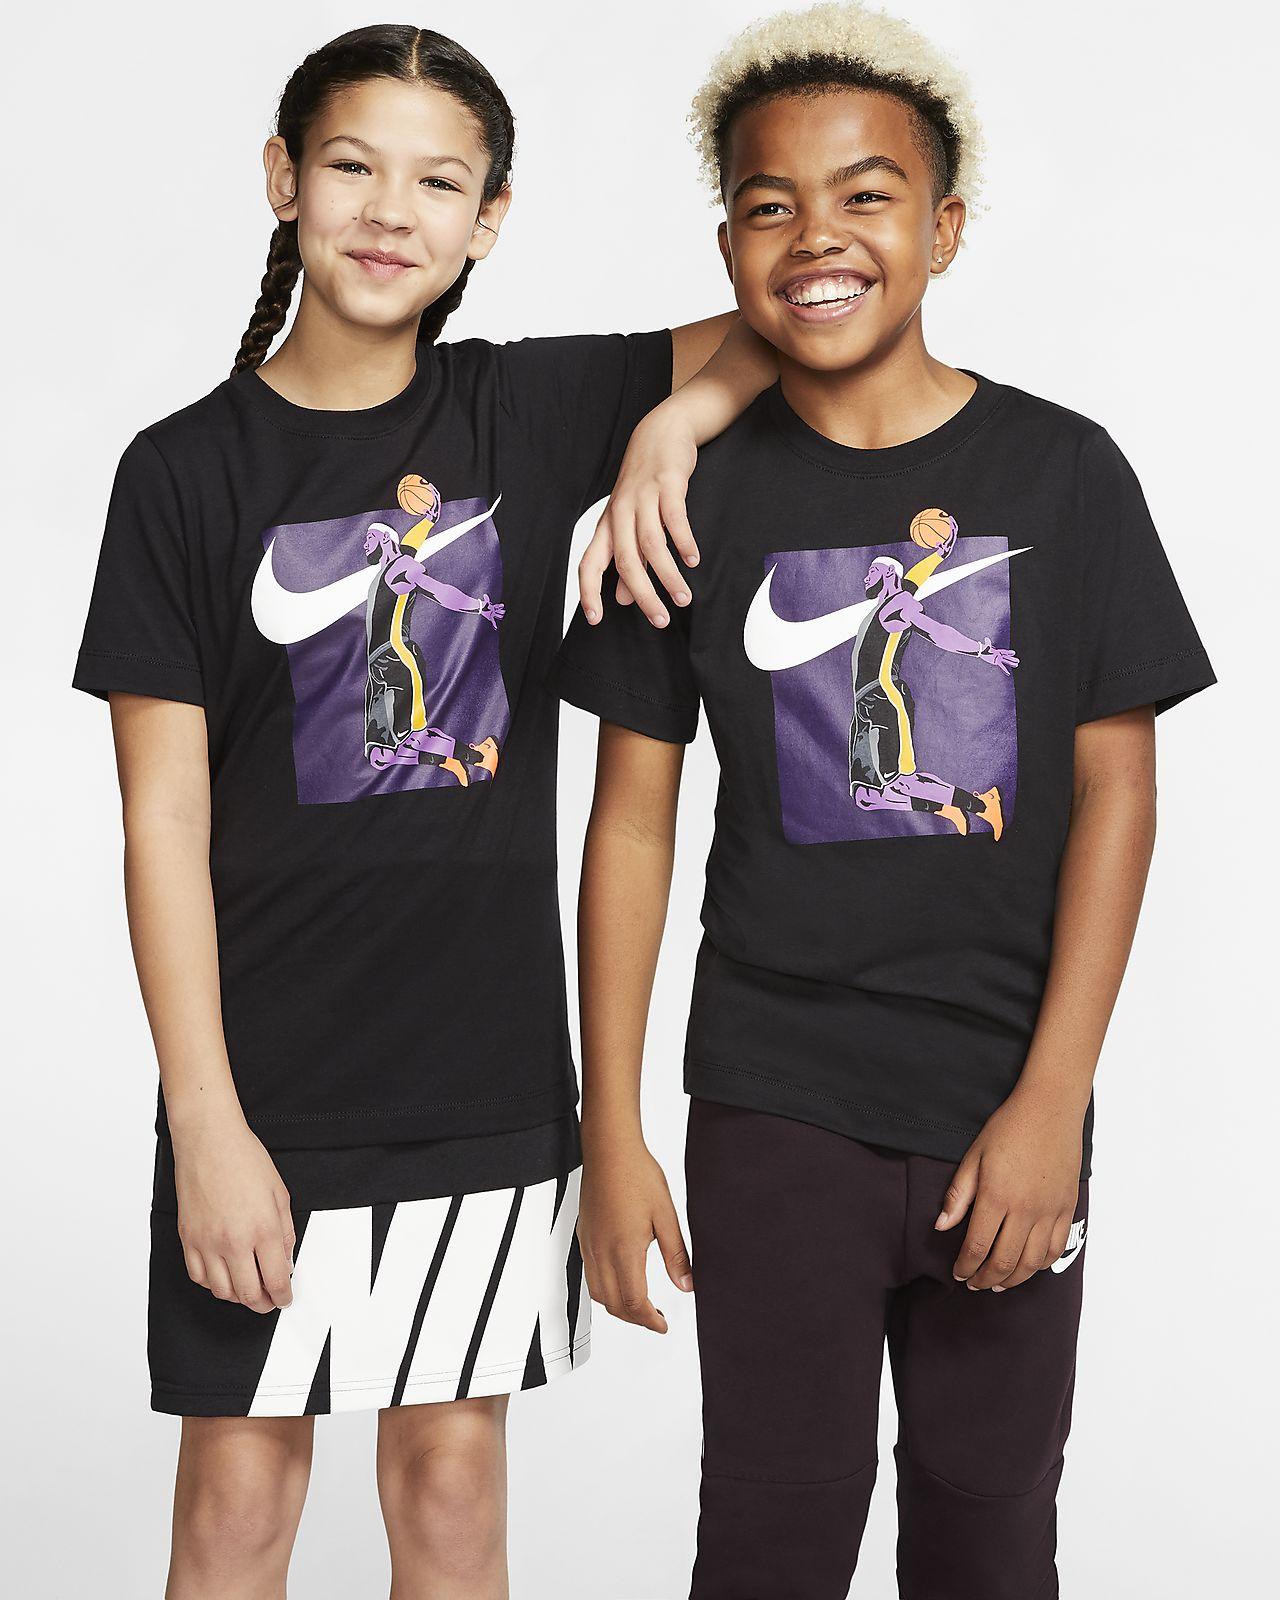 LeBron Big Kids' T-Shirt